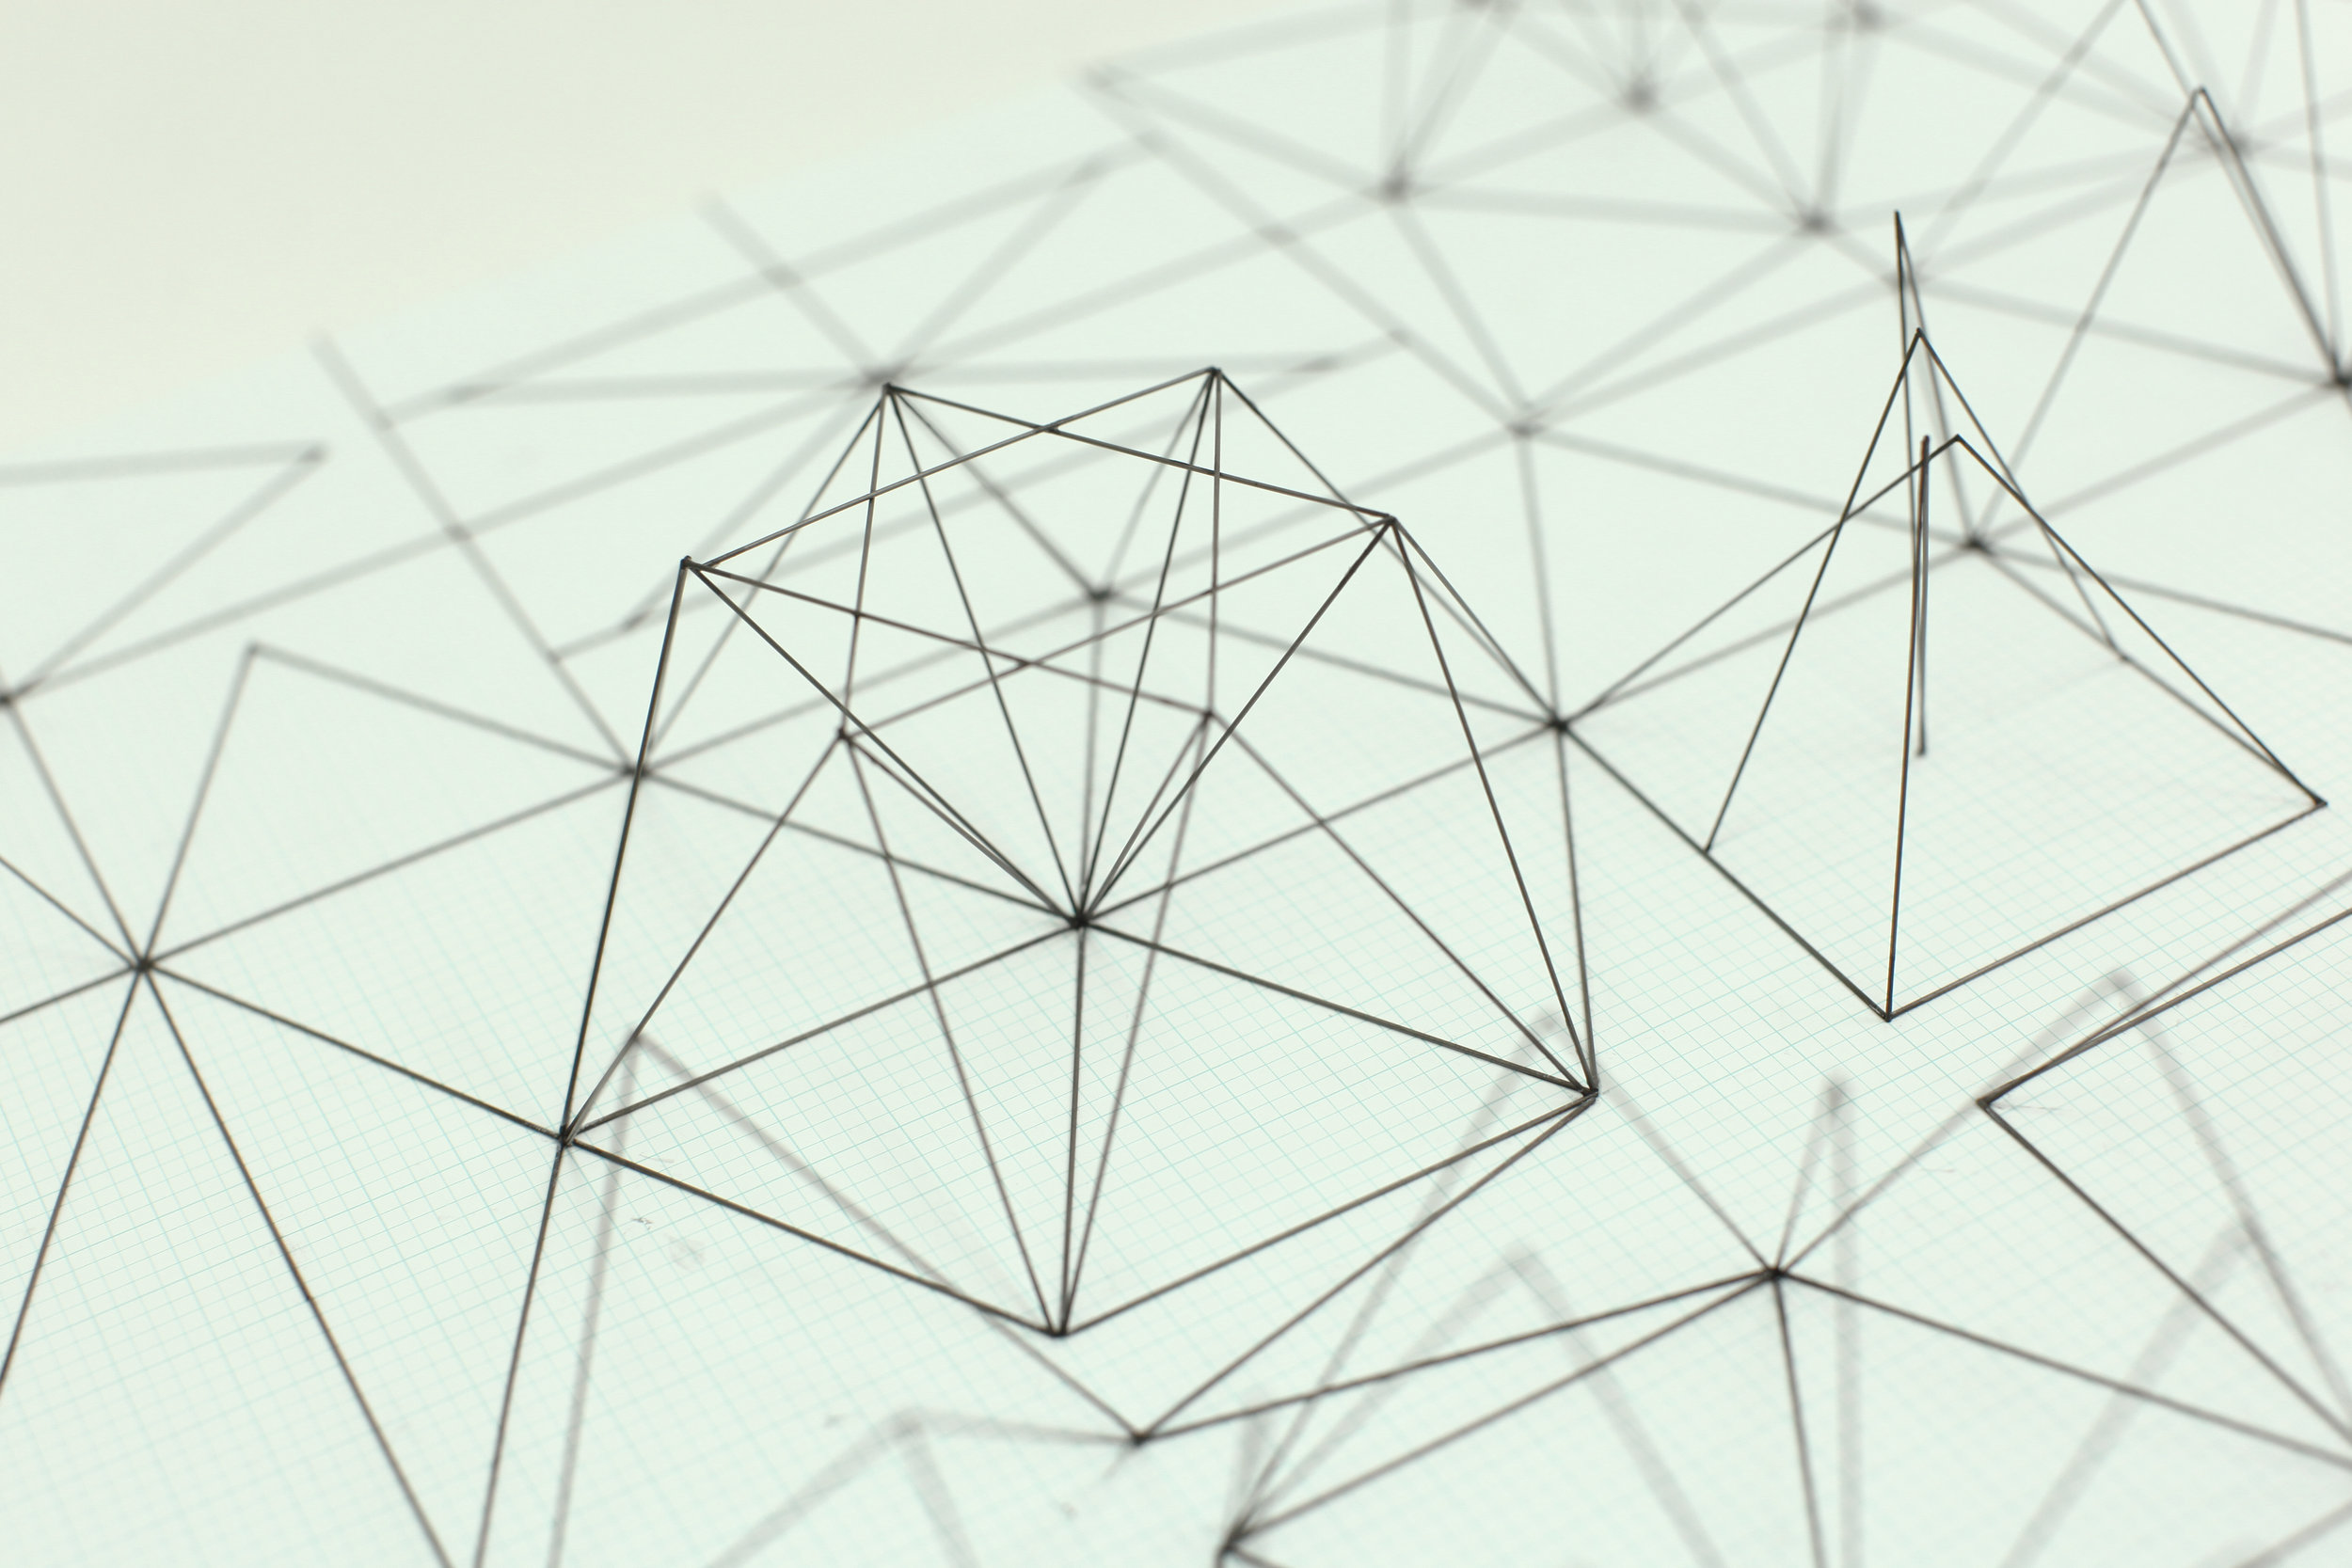 Space Sketch 1 (Detail) / 2011 / Mechanical pencil lead refill, Graph paper / 54x78x15 cm